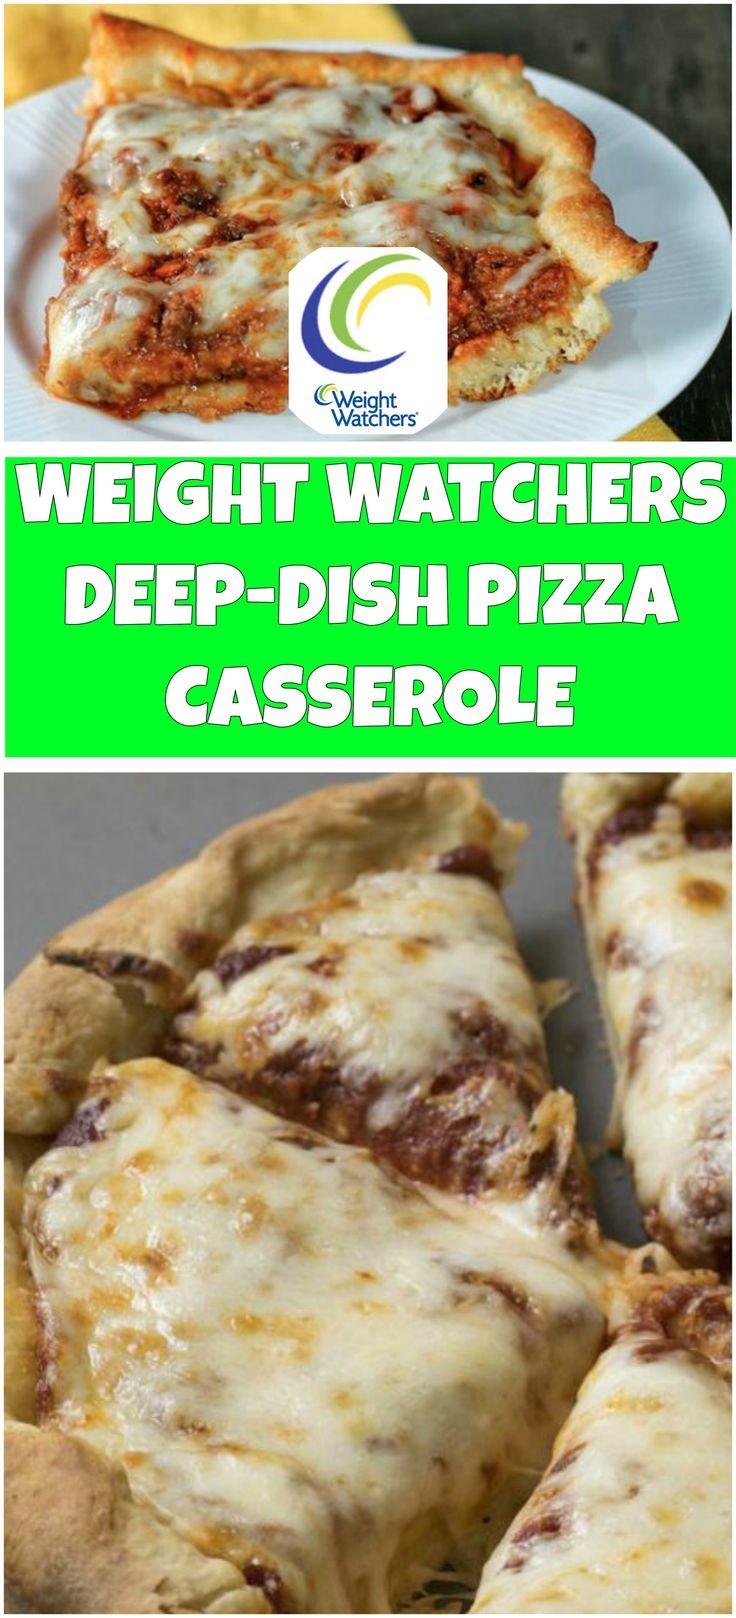 DEEP-DISH PIZZA CASSEROLE – WEIGHT WATCHERS SMARTPOINTS | free smart points recipes